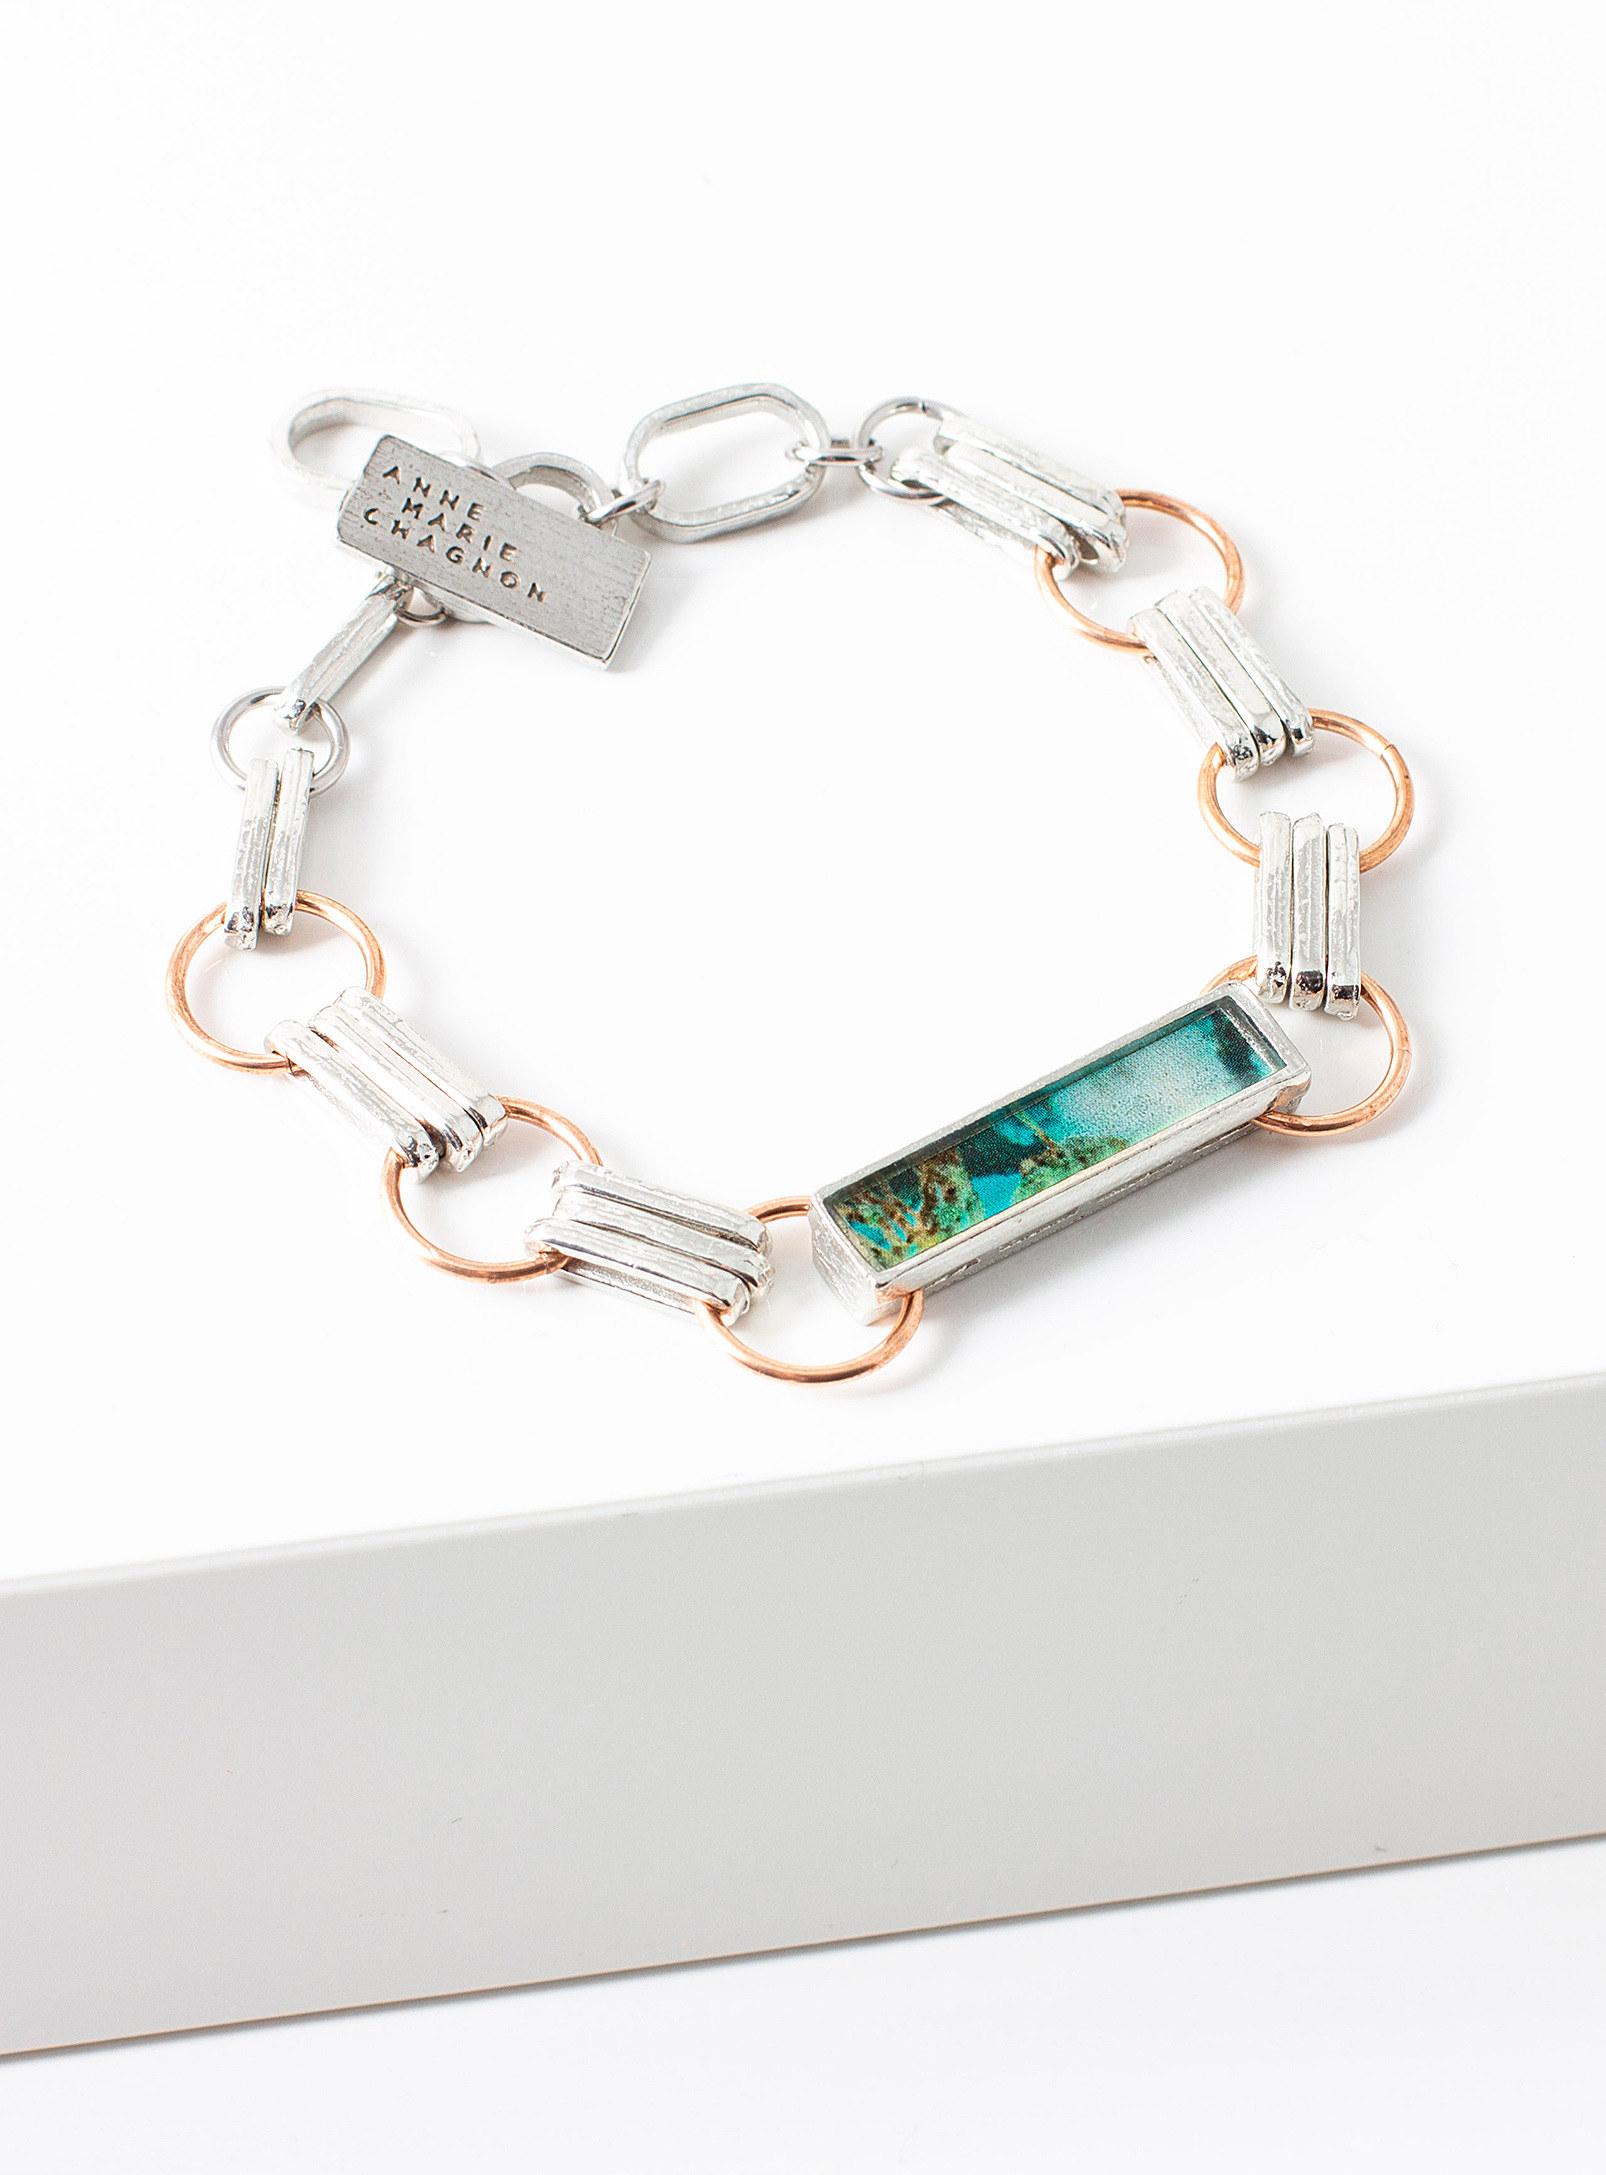 A chunky chain bracelet on a small table